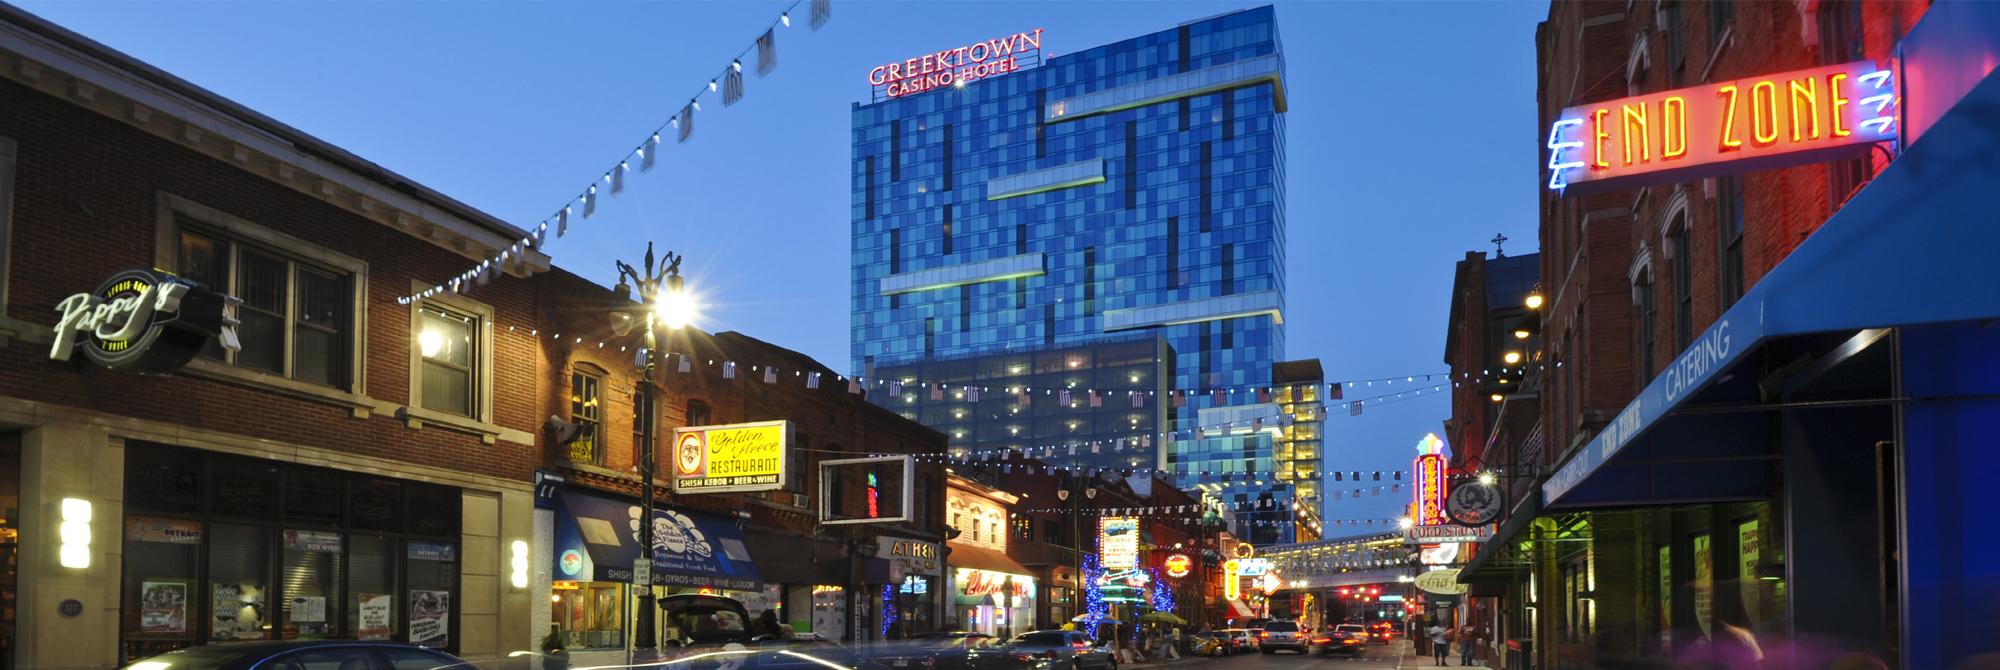 Downtown Detroit's Greektown area. Photo by Vito Palmisano. Courtesy of Detroit CVB